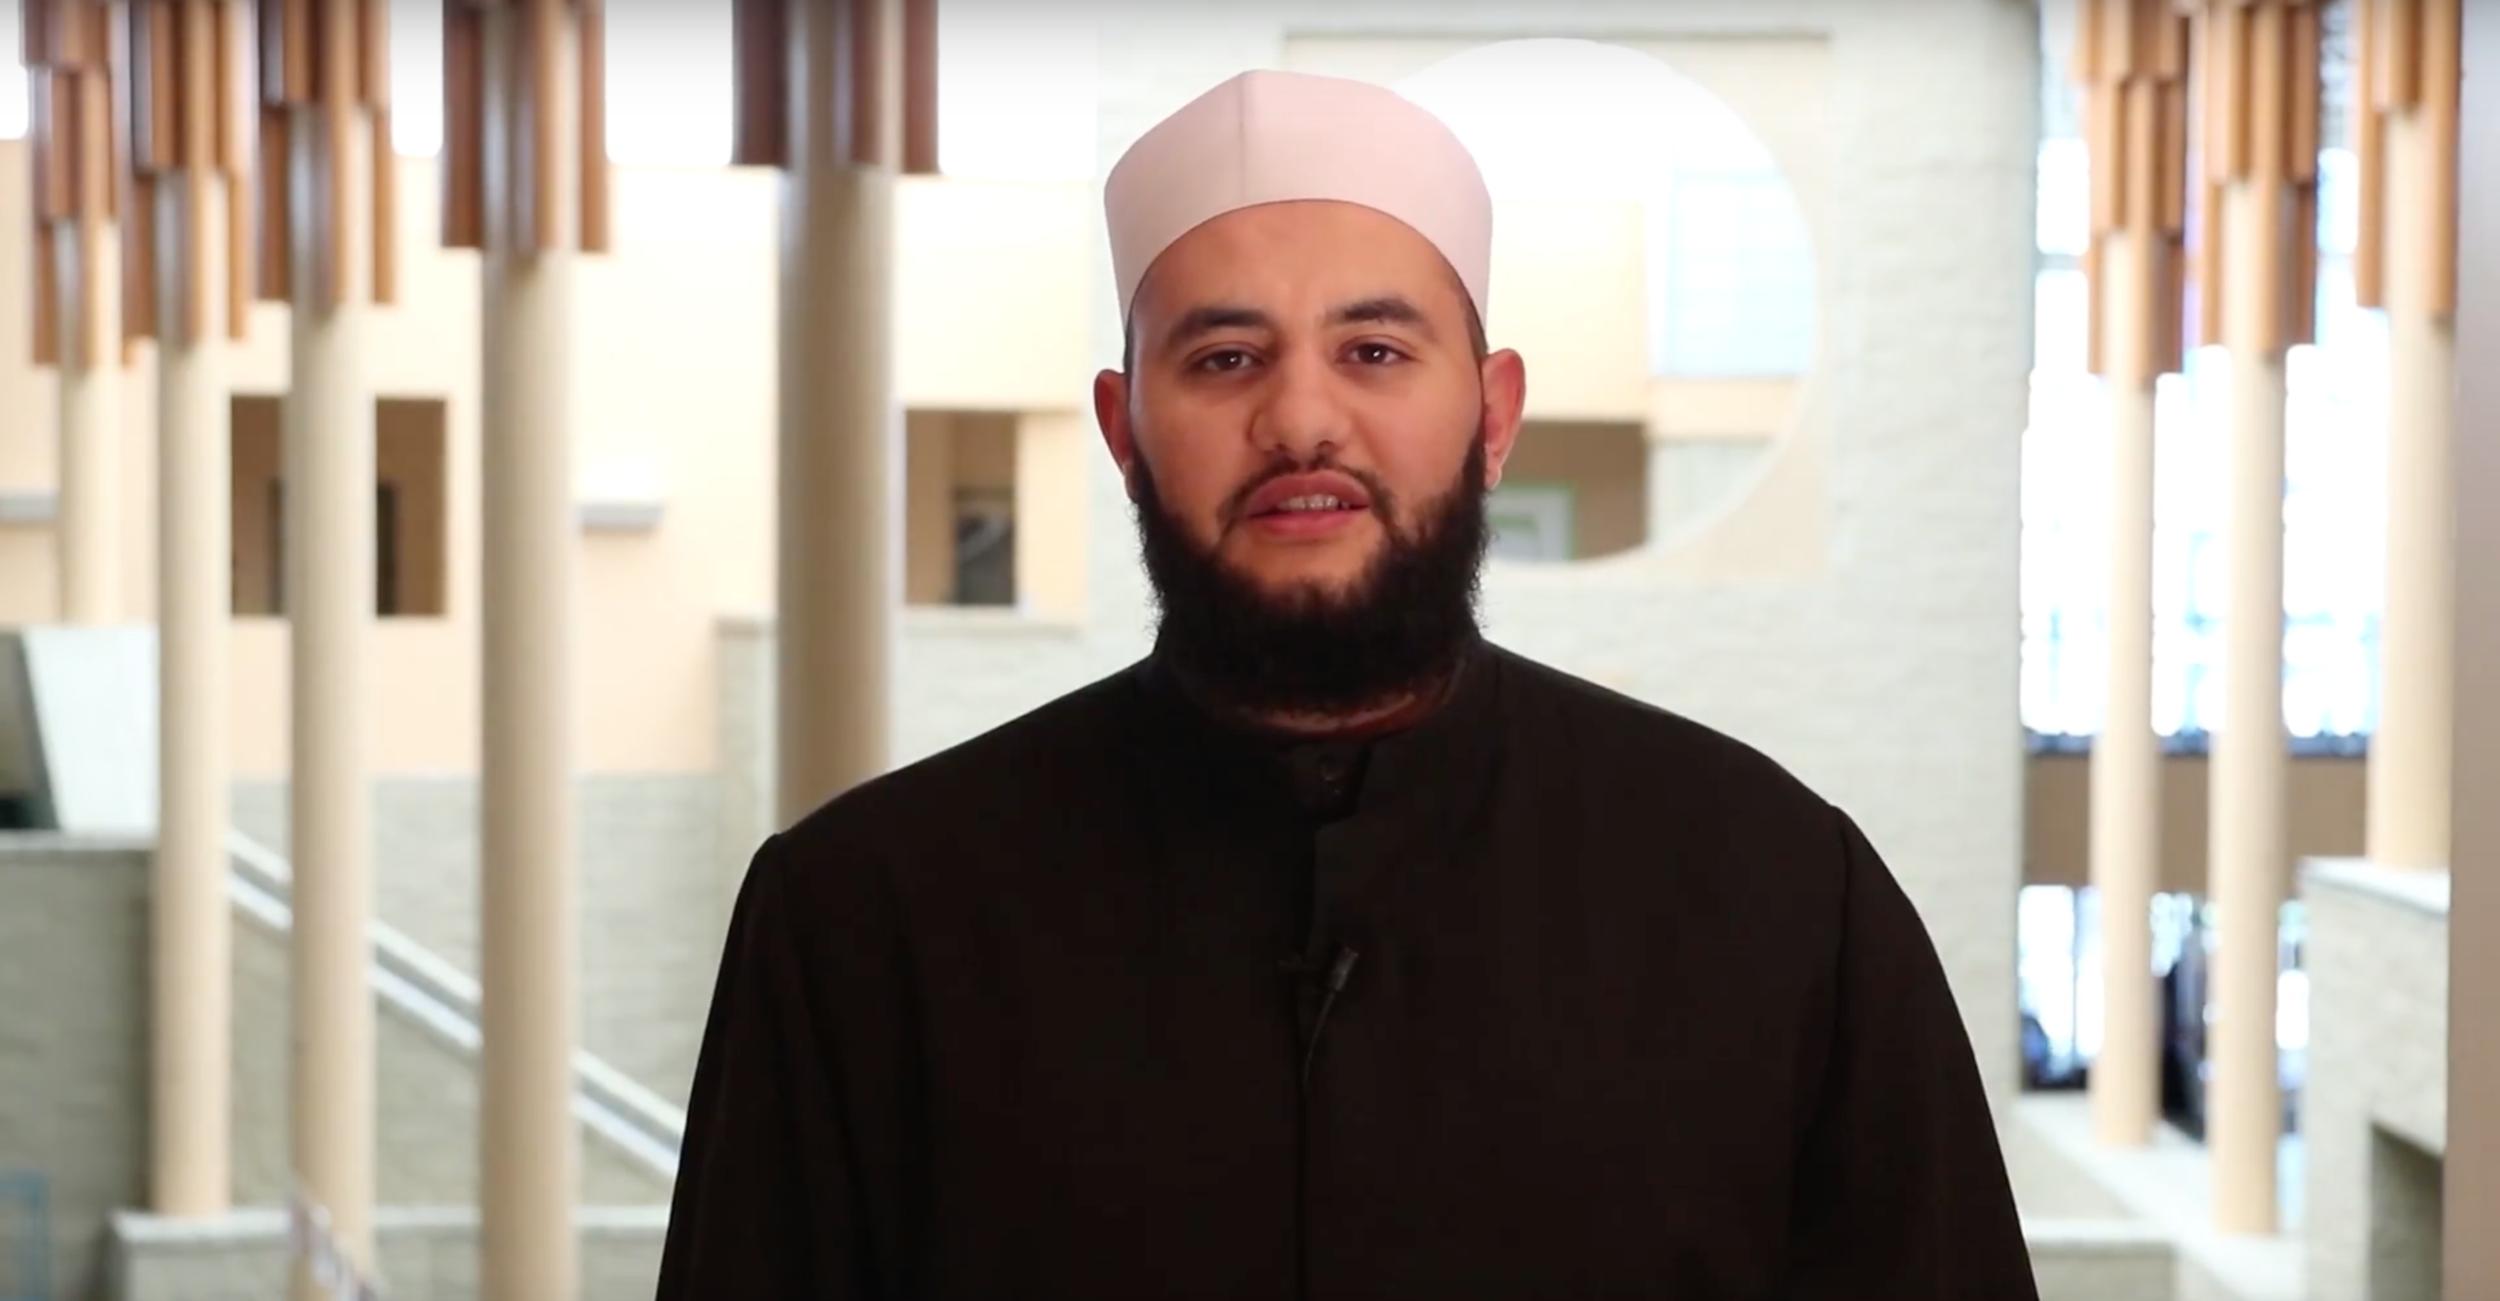 Led by Sheikh Mahmoud Omar